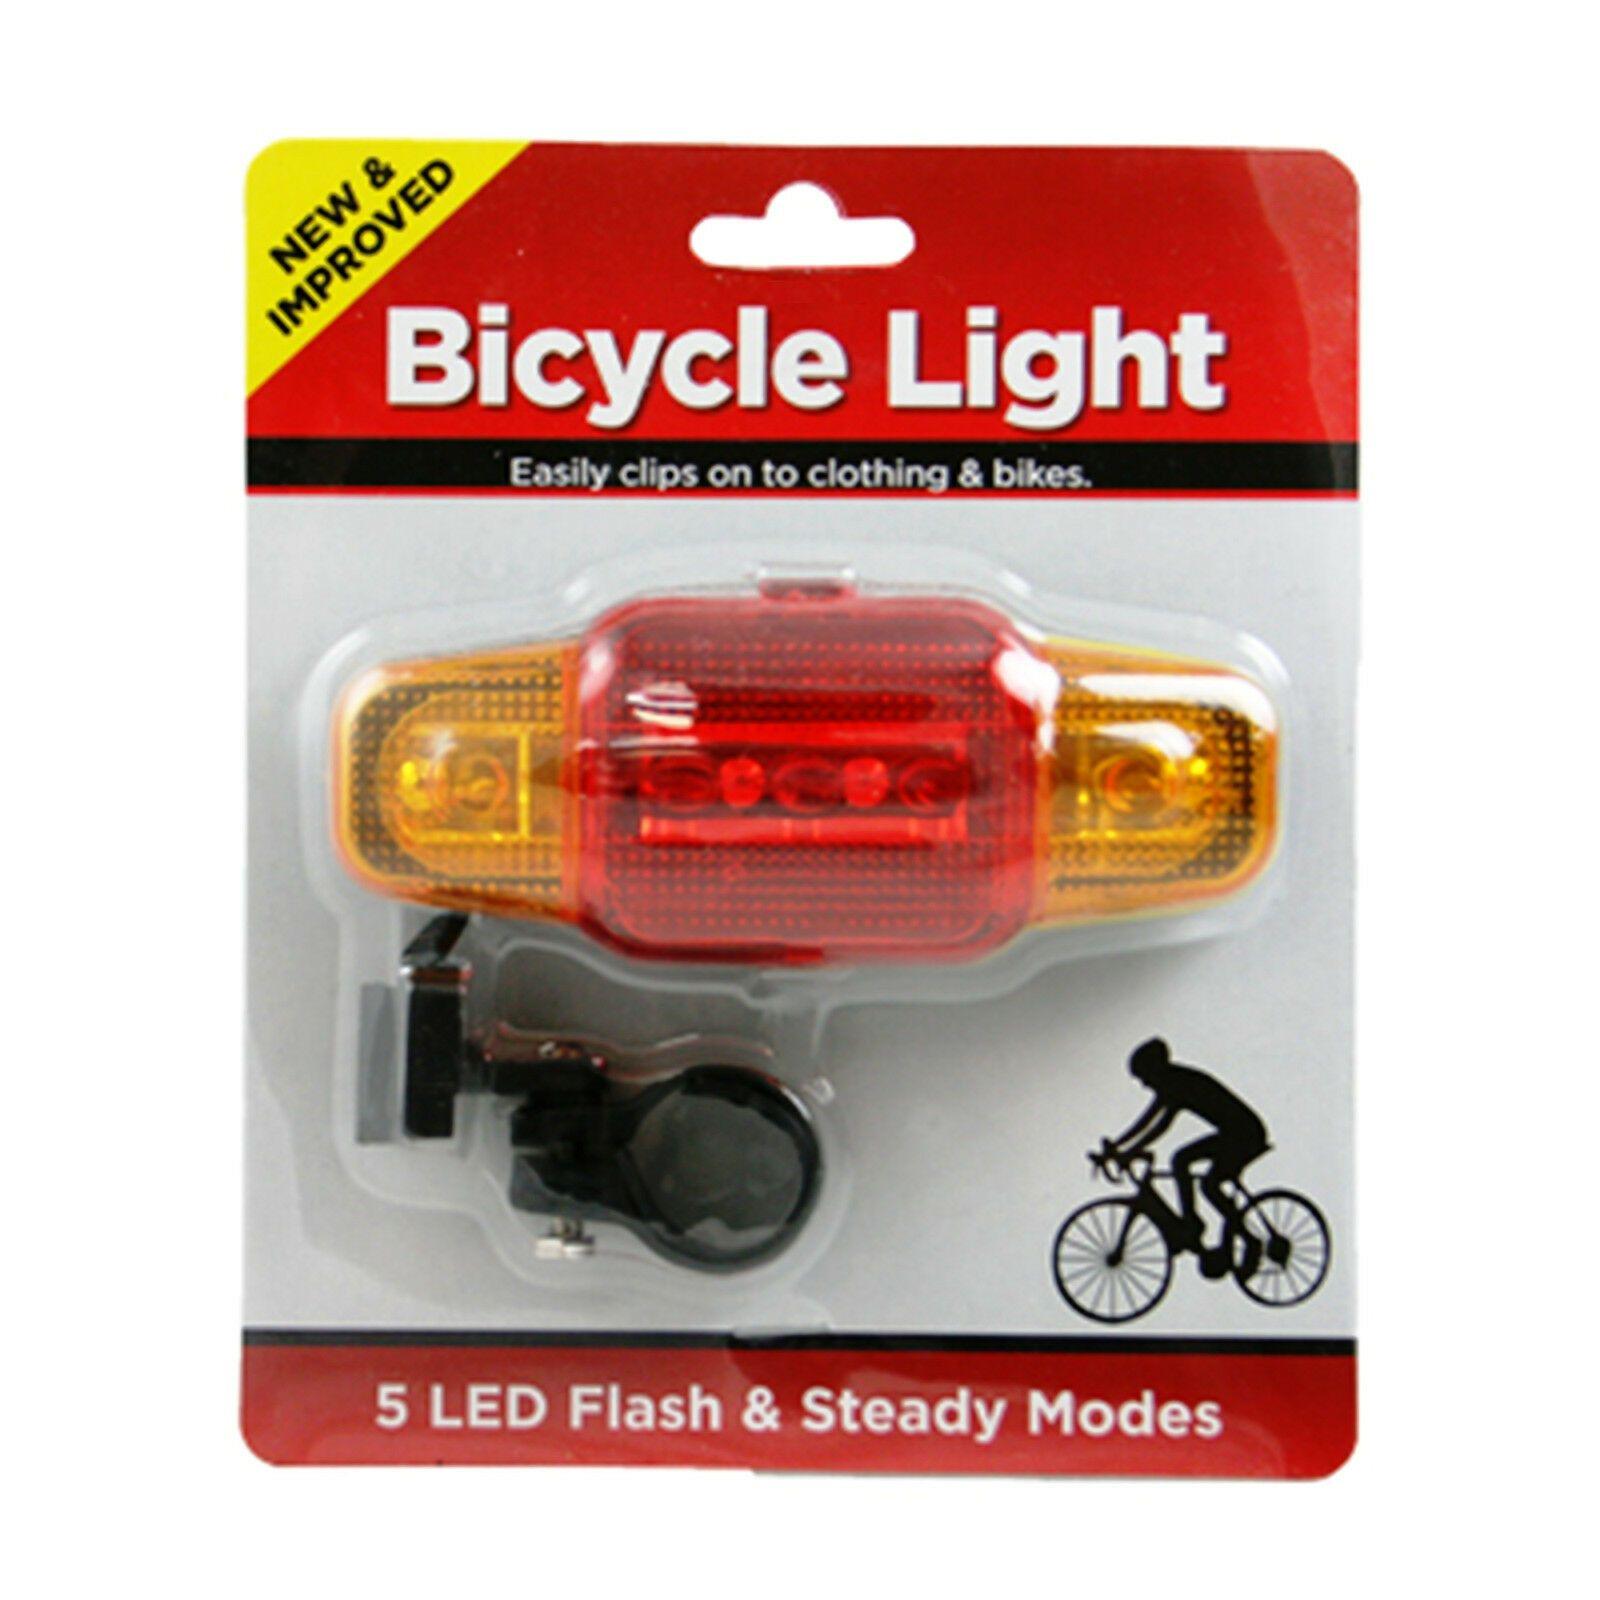 Bicycle Bike Safety Warning Tail Light Led Blinking Flash Steady Multi Modes Bicycle Light Ideas Of Bicycl Bicycle Lights Bike Lights Led Bike Tail Light